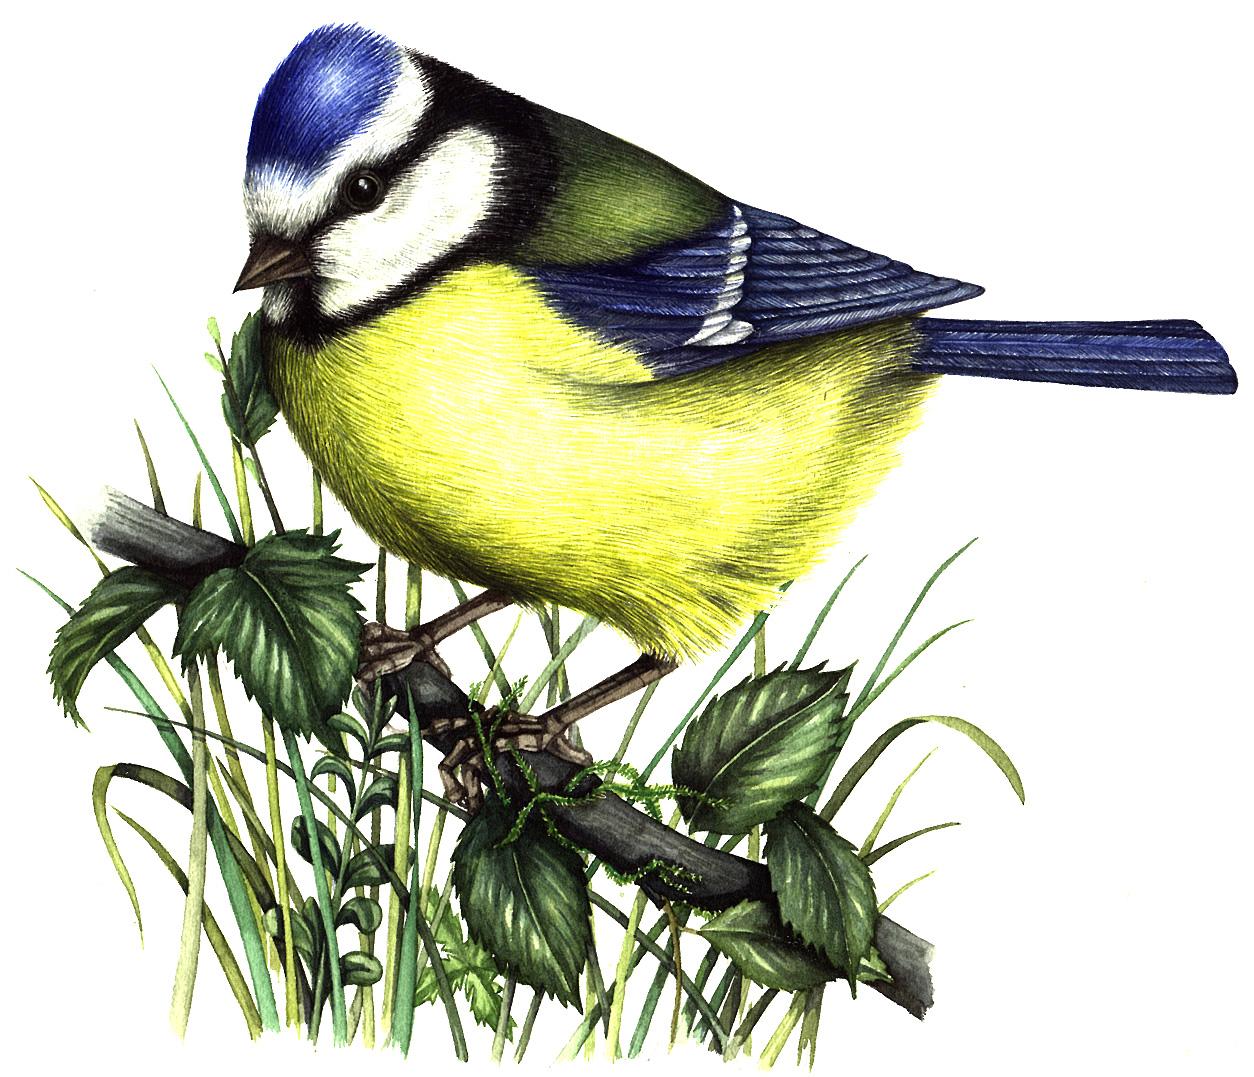 Blue tit natural history illustration by Lizzie Harper